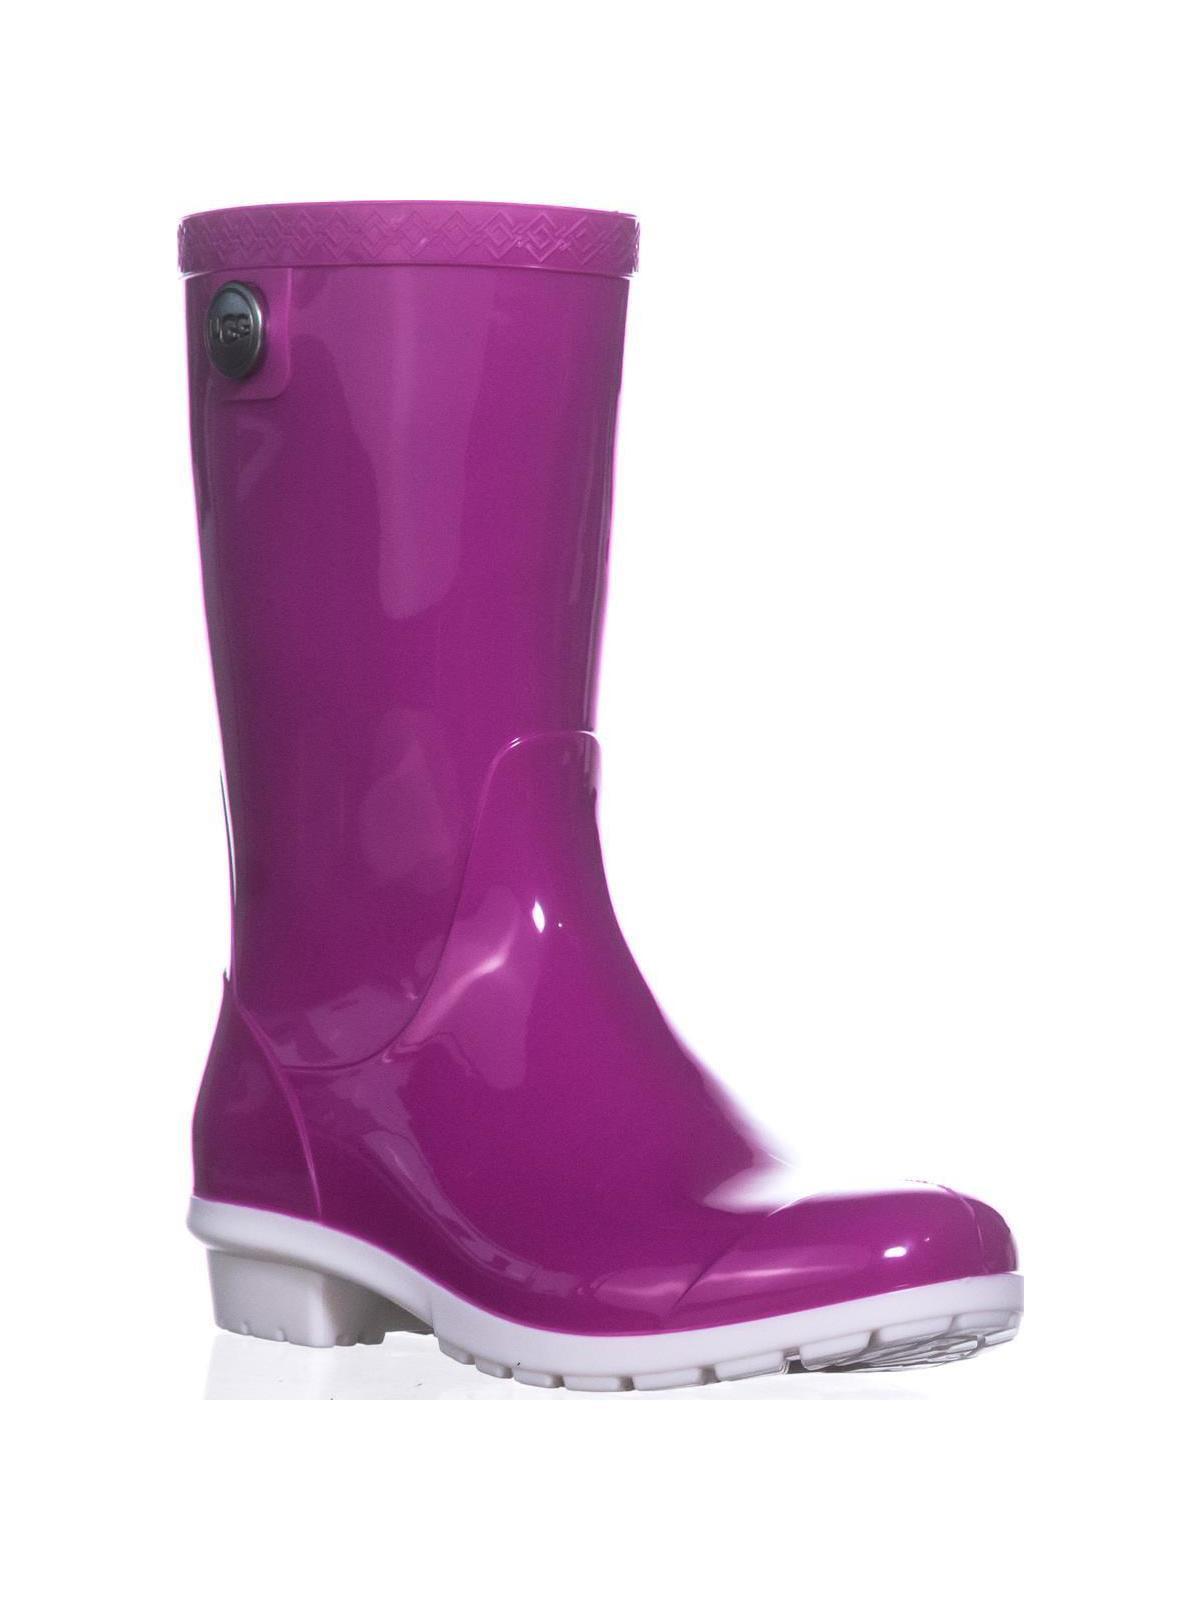 e503b68ee38 UGG Australia Sienna Mid-Calf Rain Boots, Neon Pink